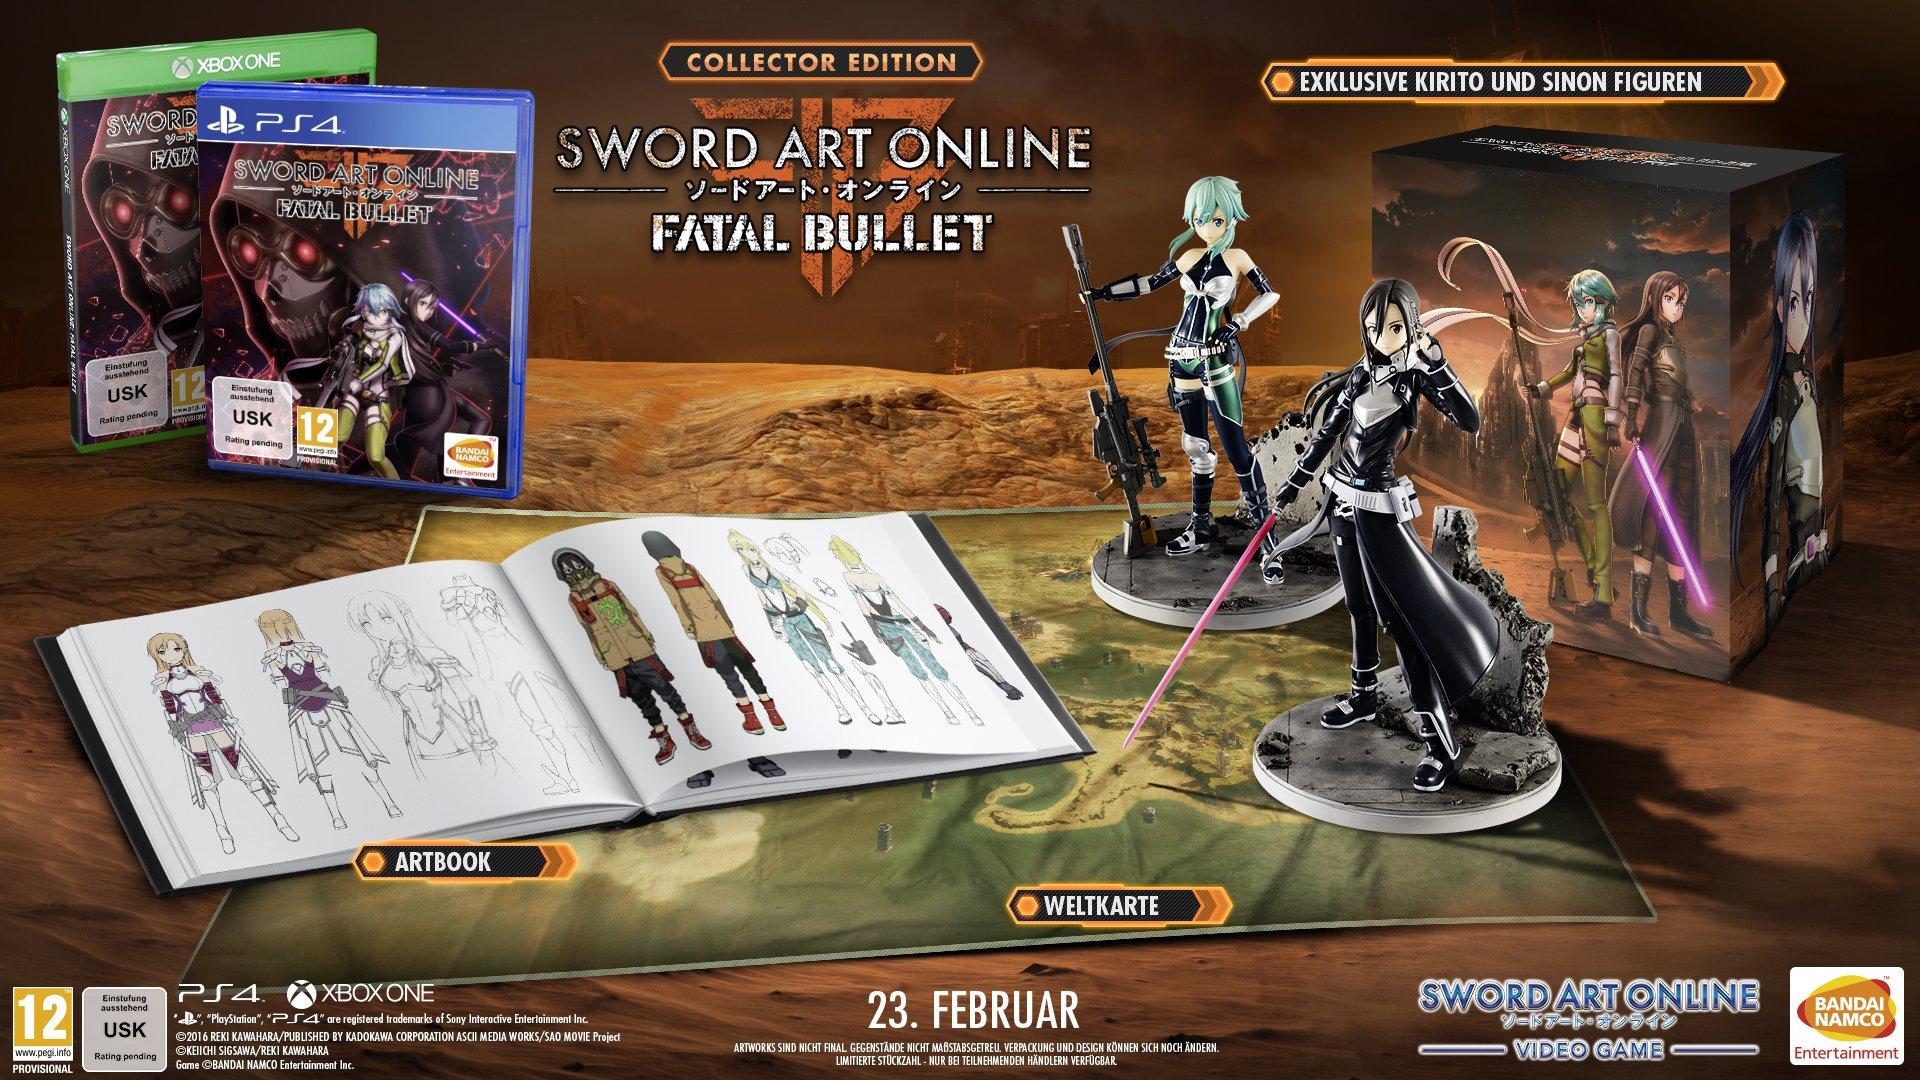 Sword Art Online Fatal Bullet Collector Edition